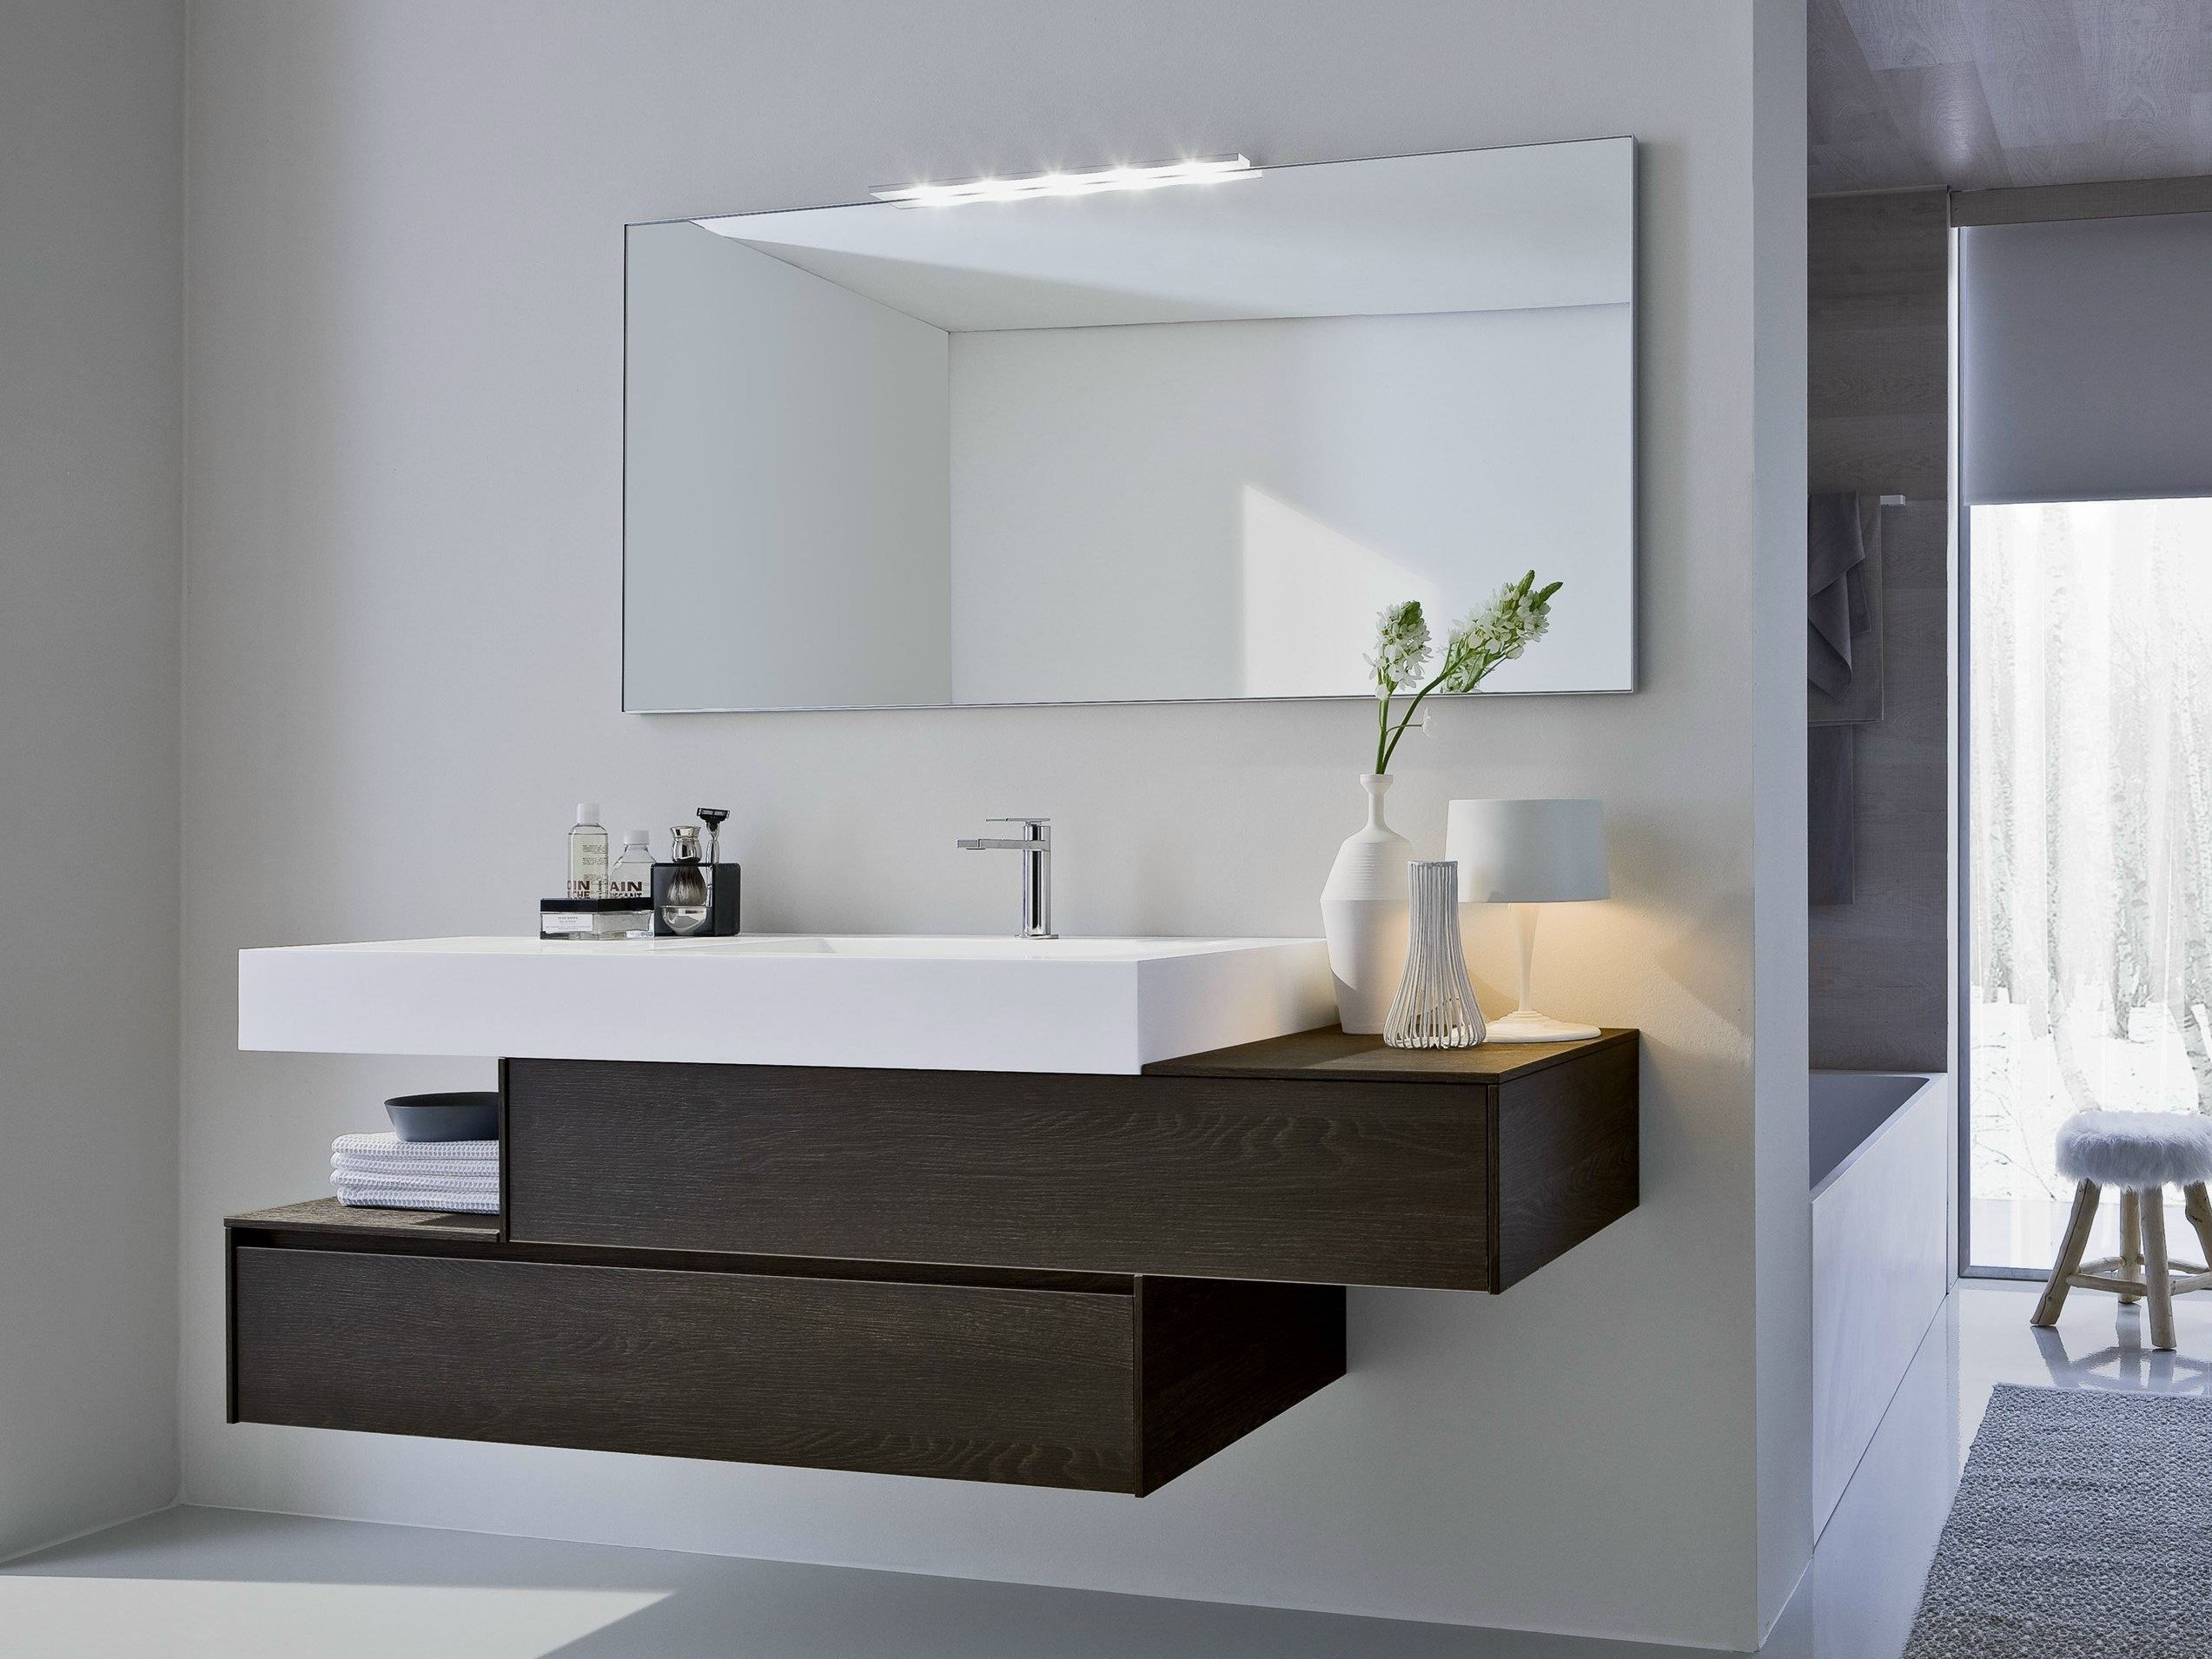 Mueble bajo lavabo con cajones con espejo COMP N02